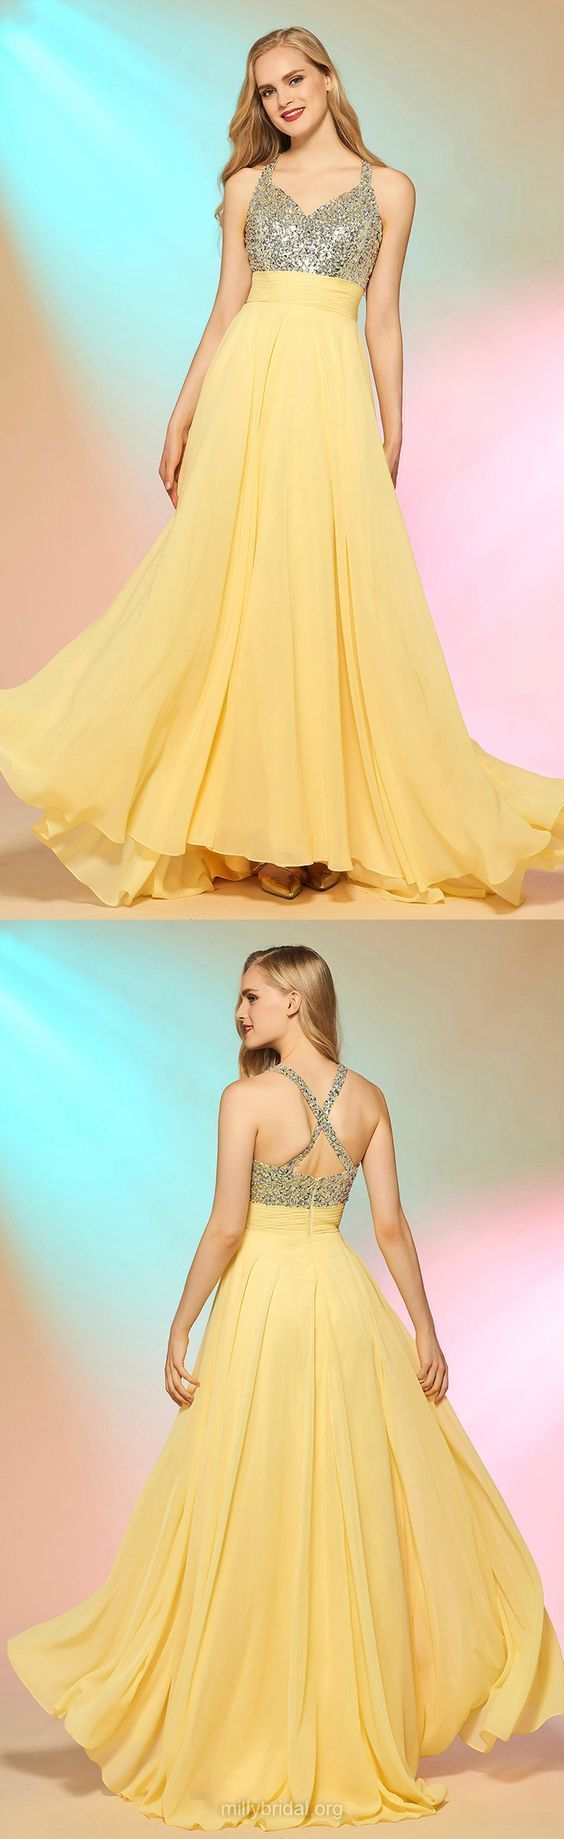 Yellow Prom Dresses Long Prom Dressesi A Line Prom Dresses V Neck Chiffon Prom Dresses With Beadin Prom Dresses Yellow Prom Dresses Long Prom Dresses Modest [ 1839 x 564 Pixel ]